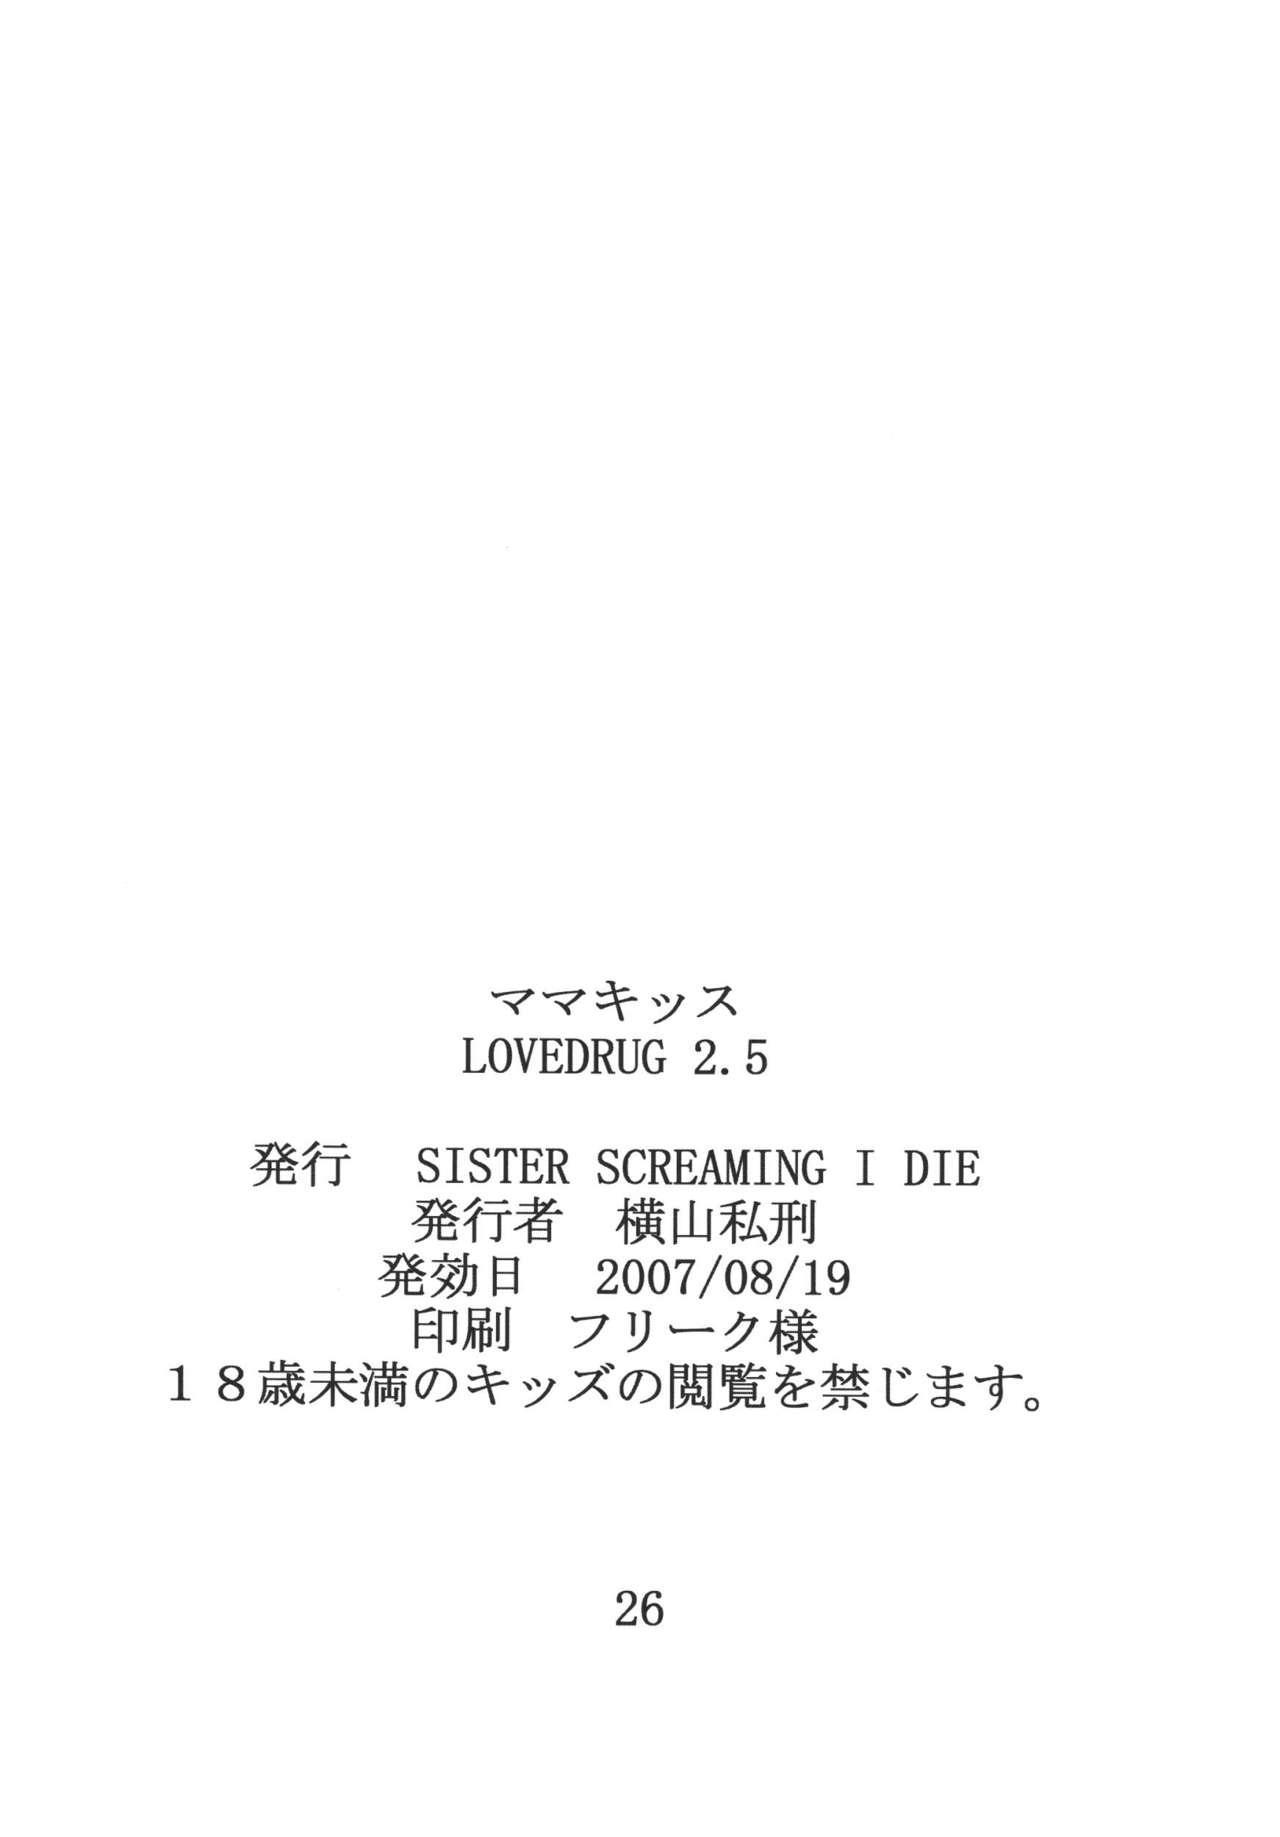 Lovedrug 2.5 24